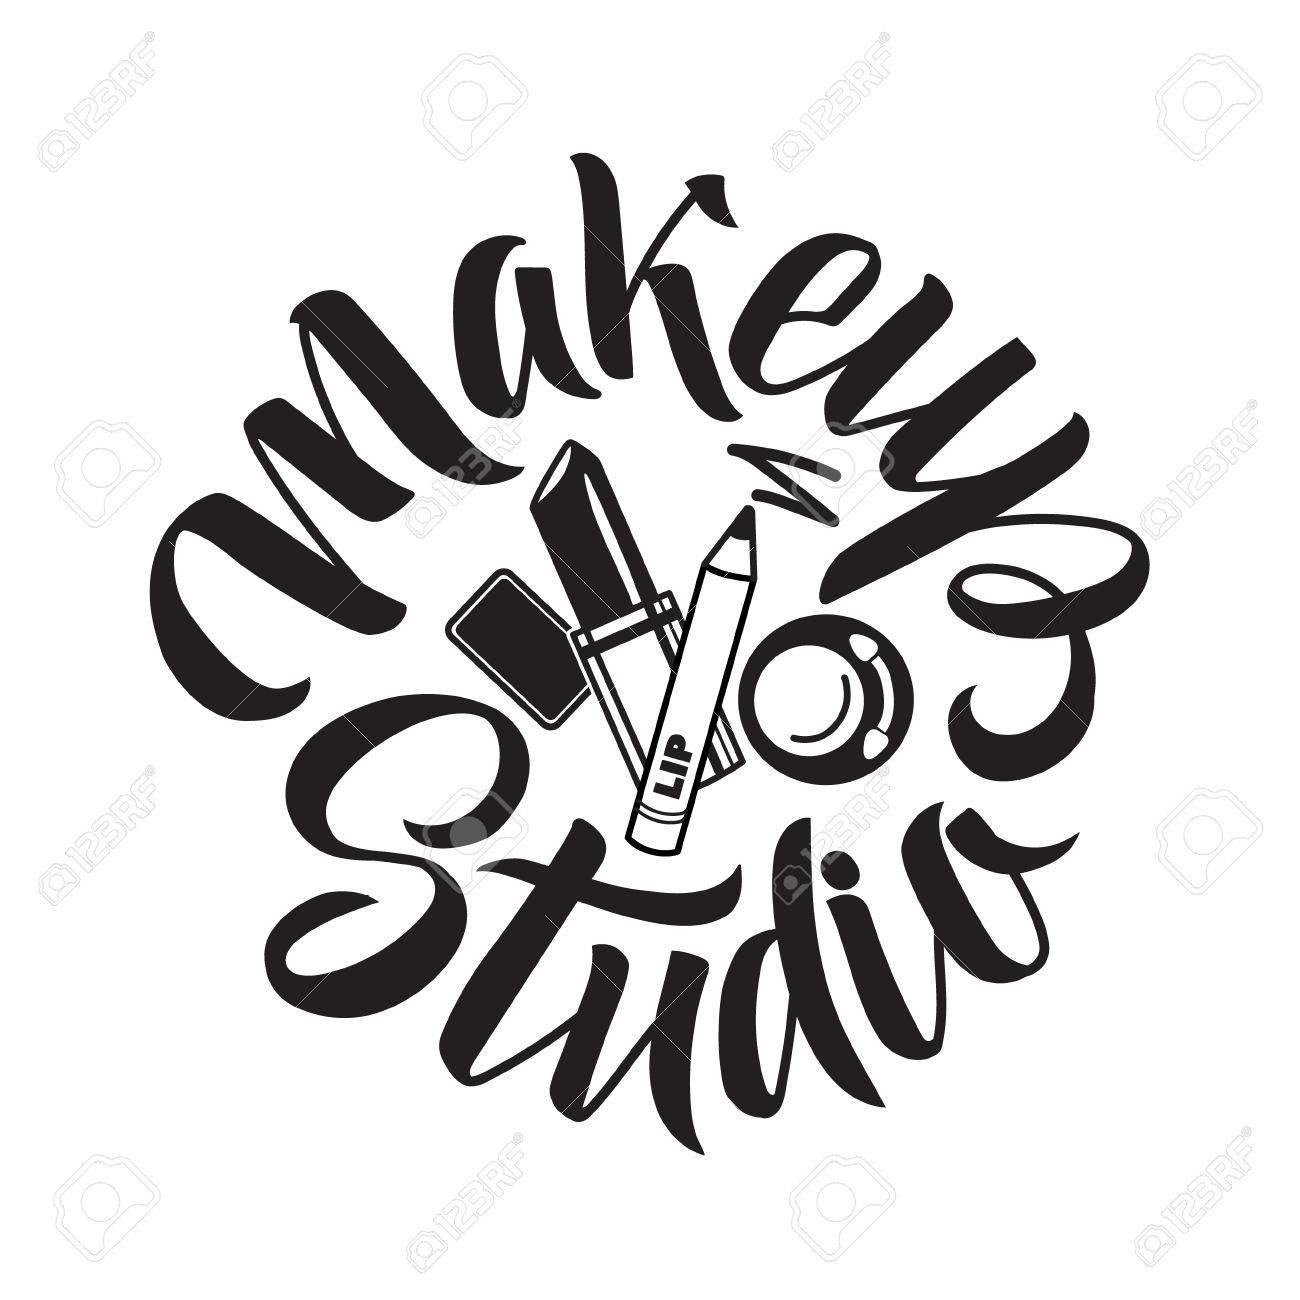 Makeup Brushes Drawing At Getdrawings